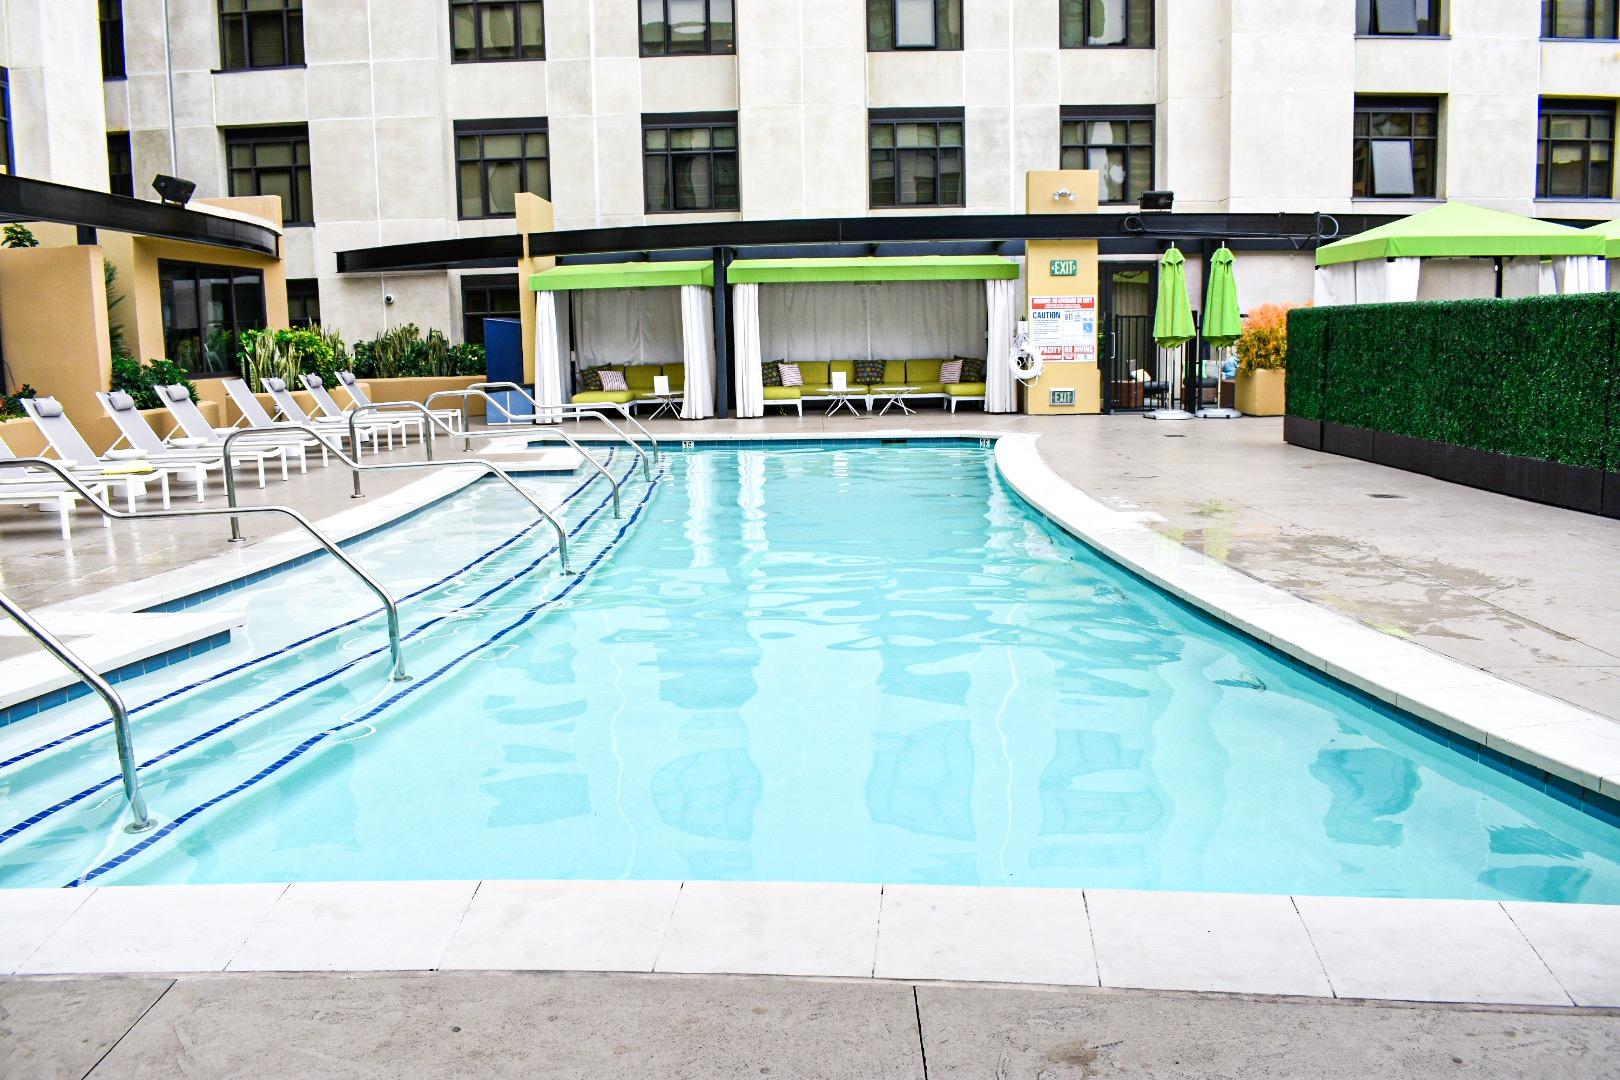 hotle solamar pool mermaid core class bloody mayr obsessed.jpg